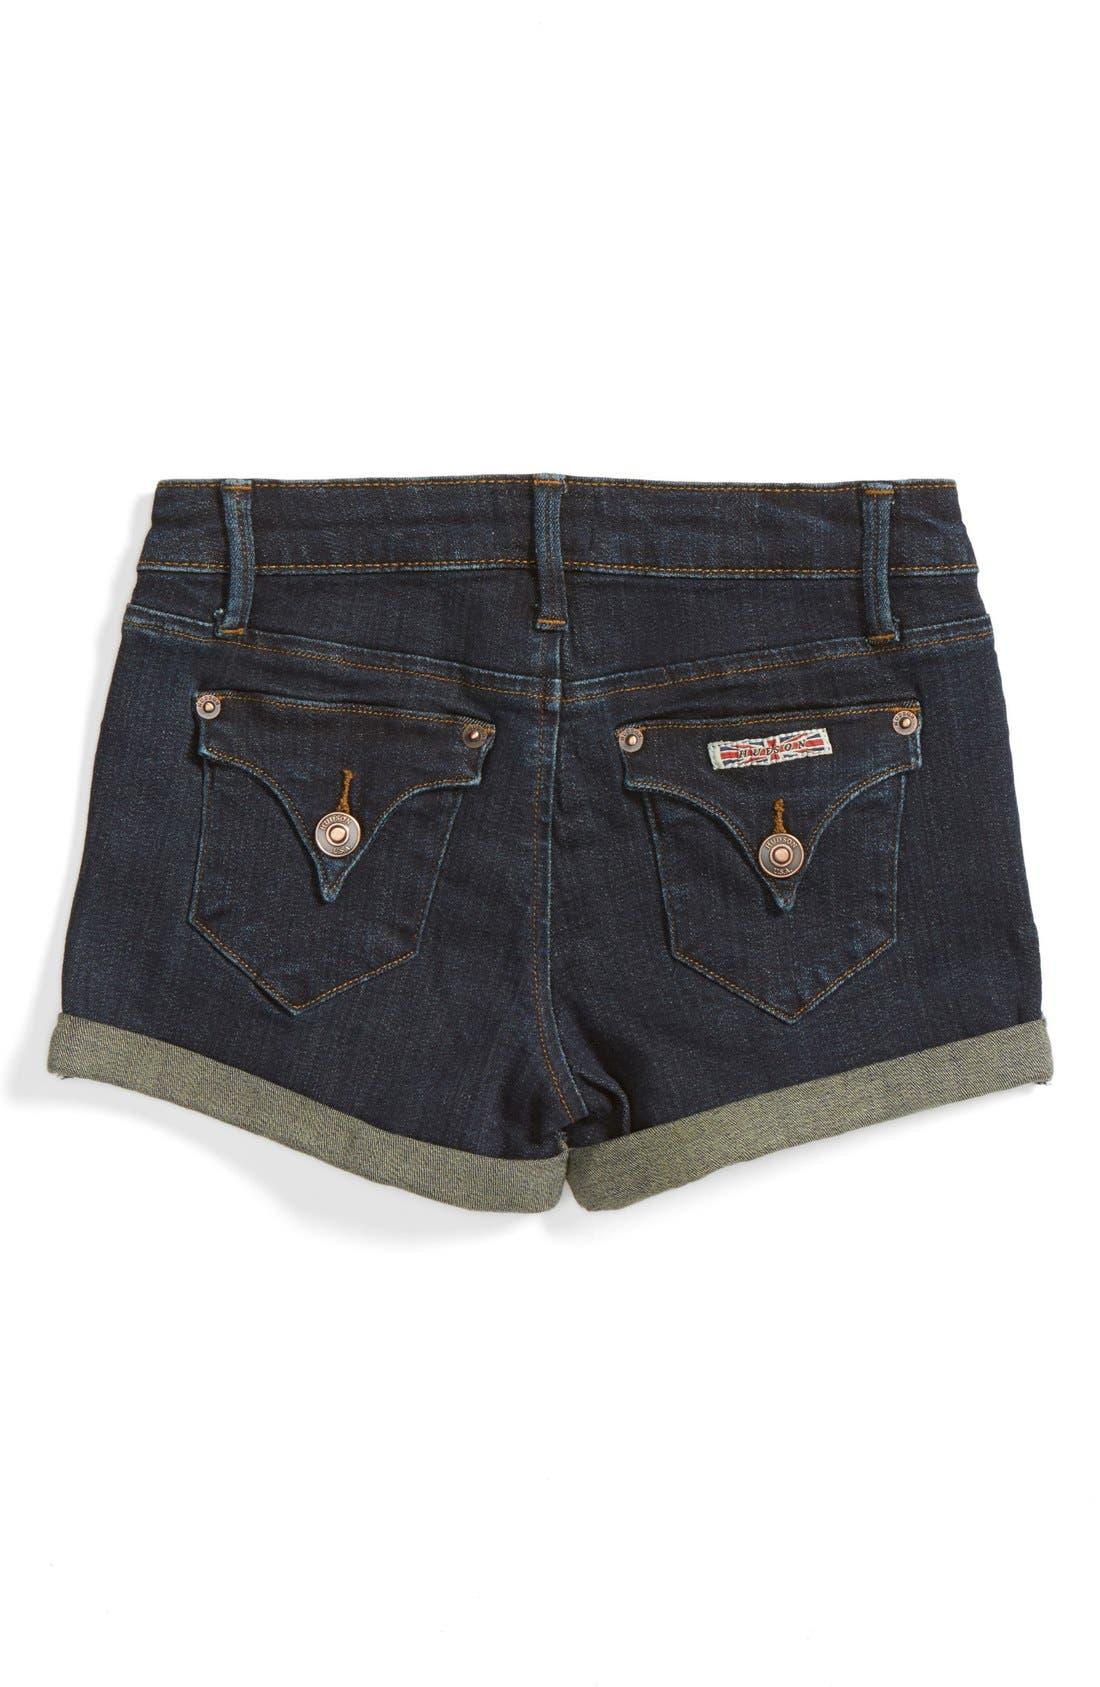 Roll Cuff Denim Shorts,                             Alternate thumbnail 2, color,                             Pressed Rinse